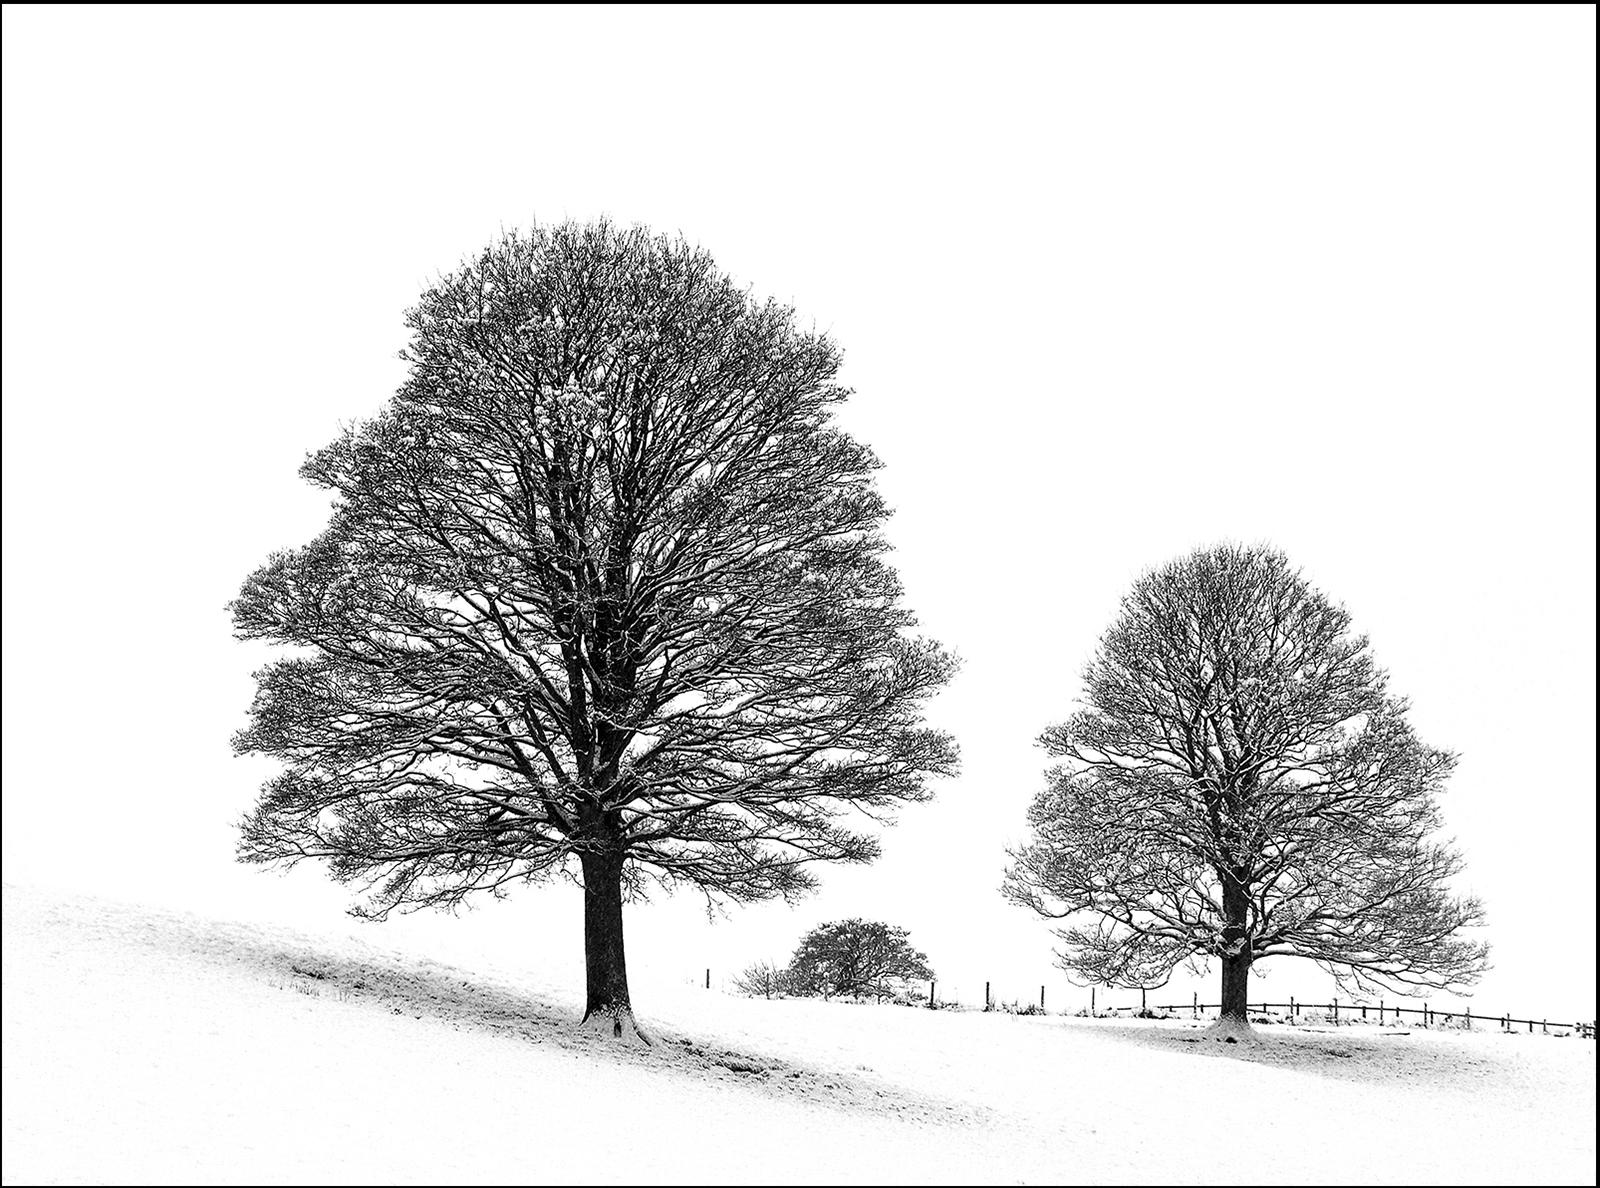 Midwinter Trees